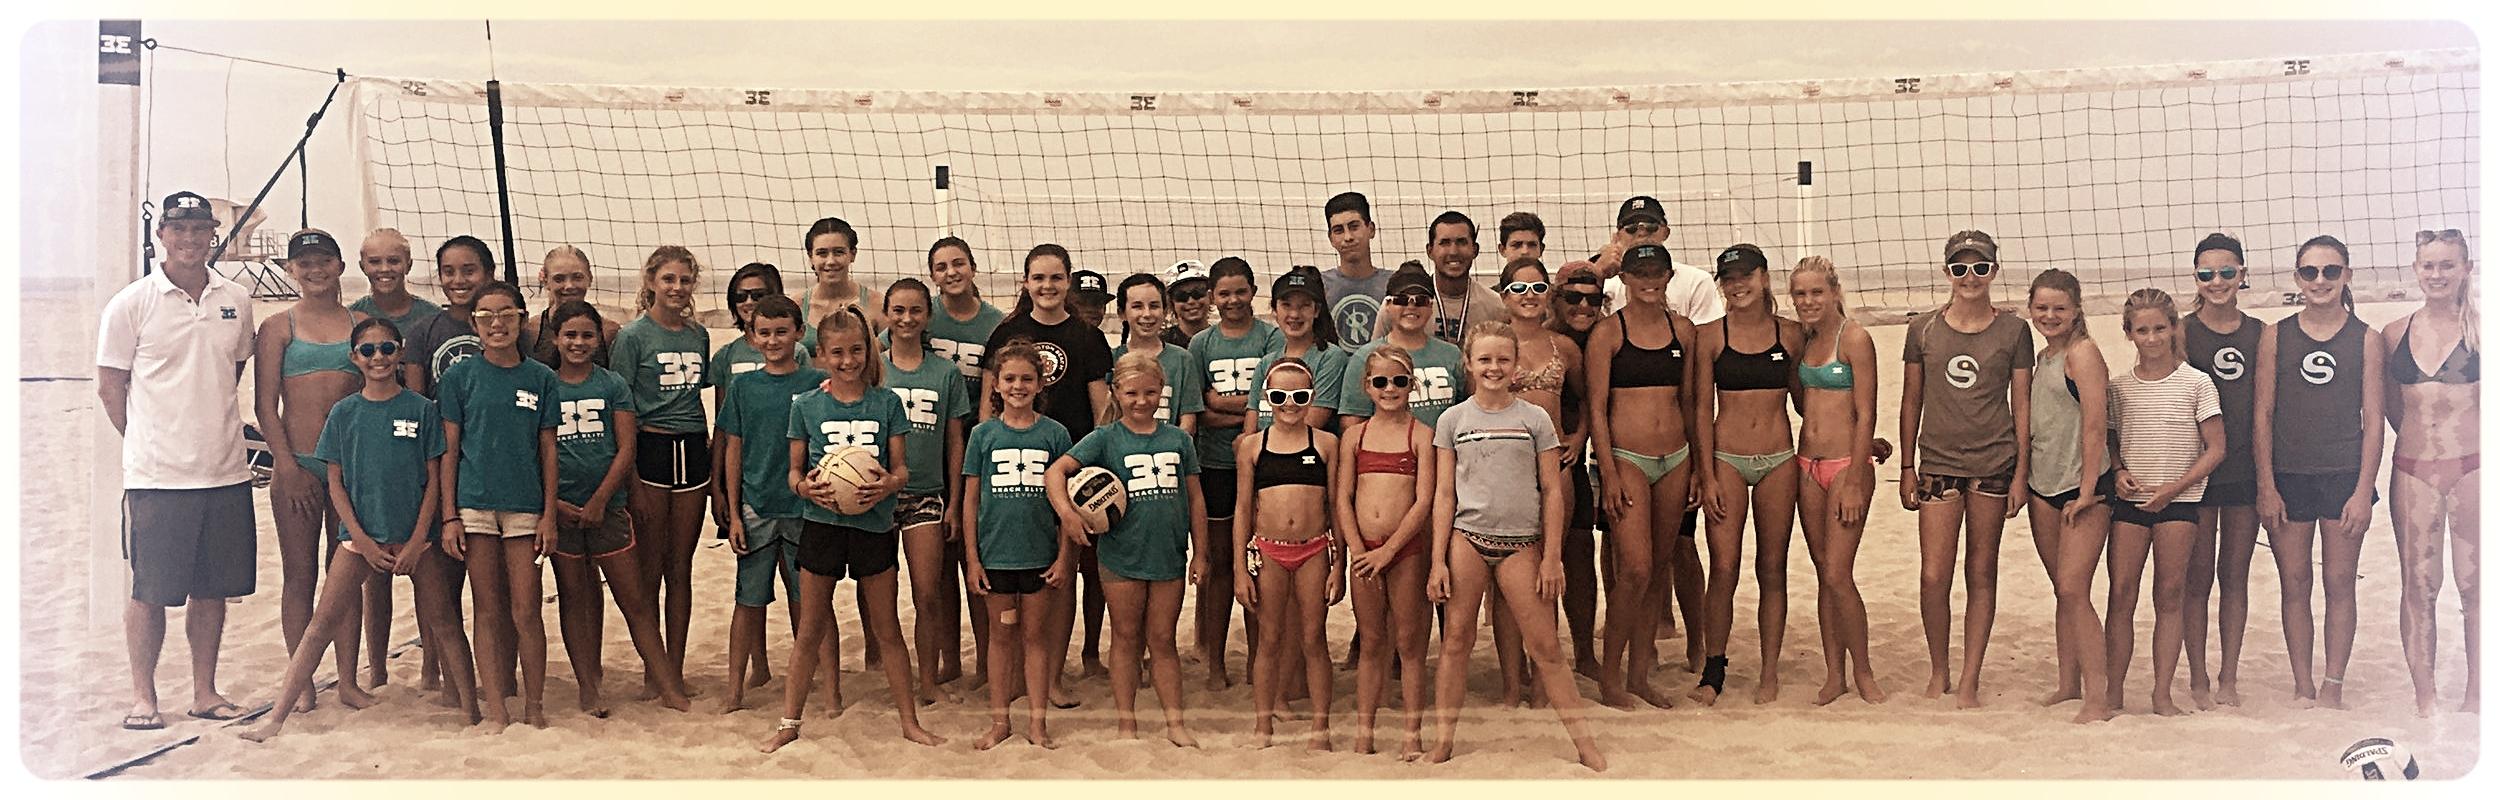 beach elite group photo